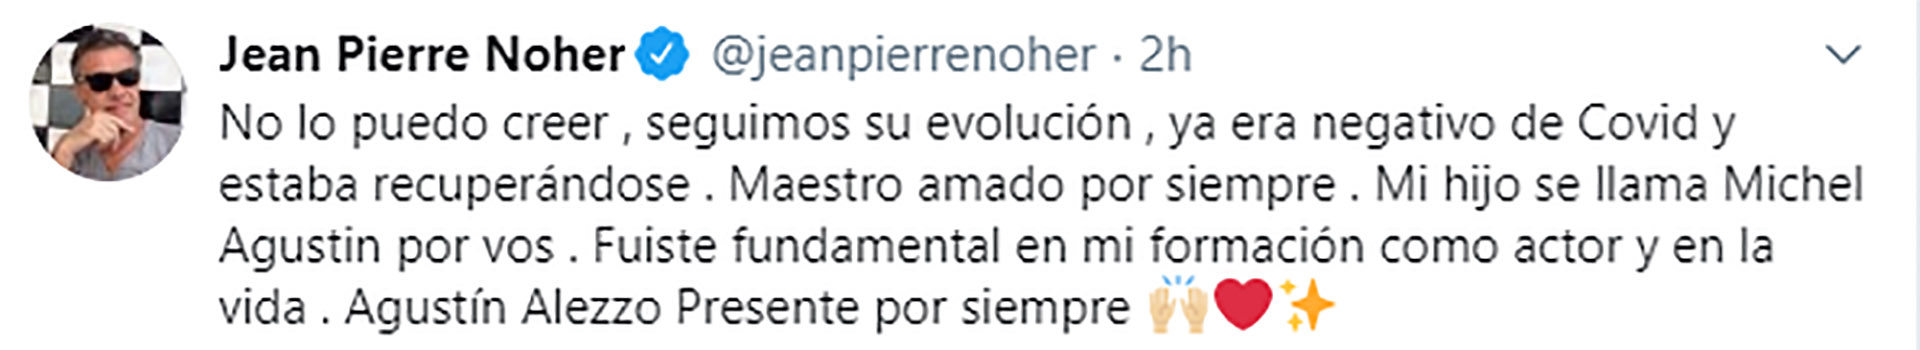 La tristeza de Jean Pierre Noher